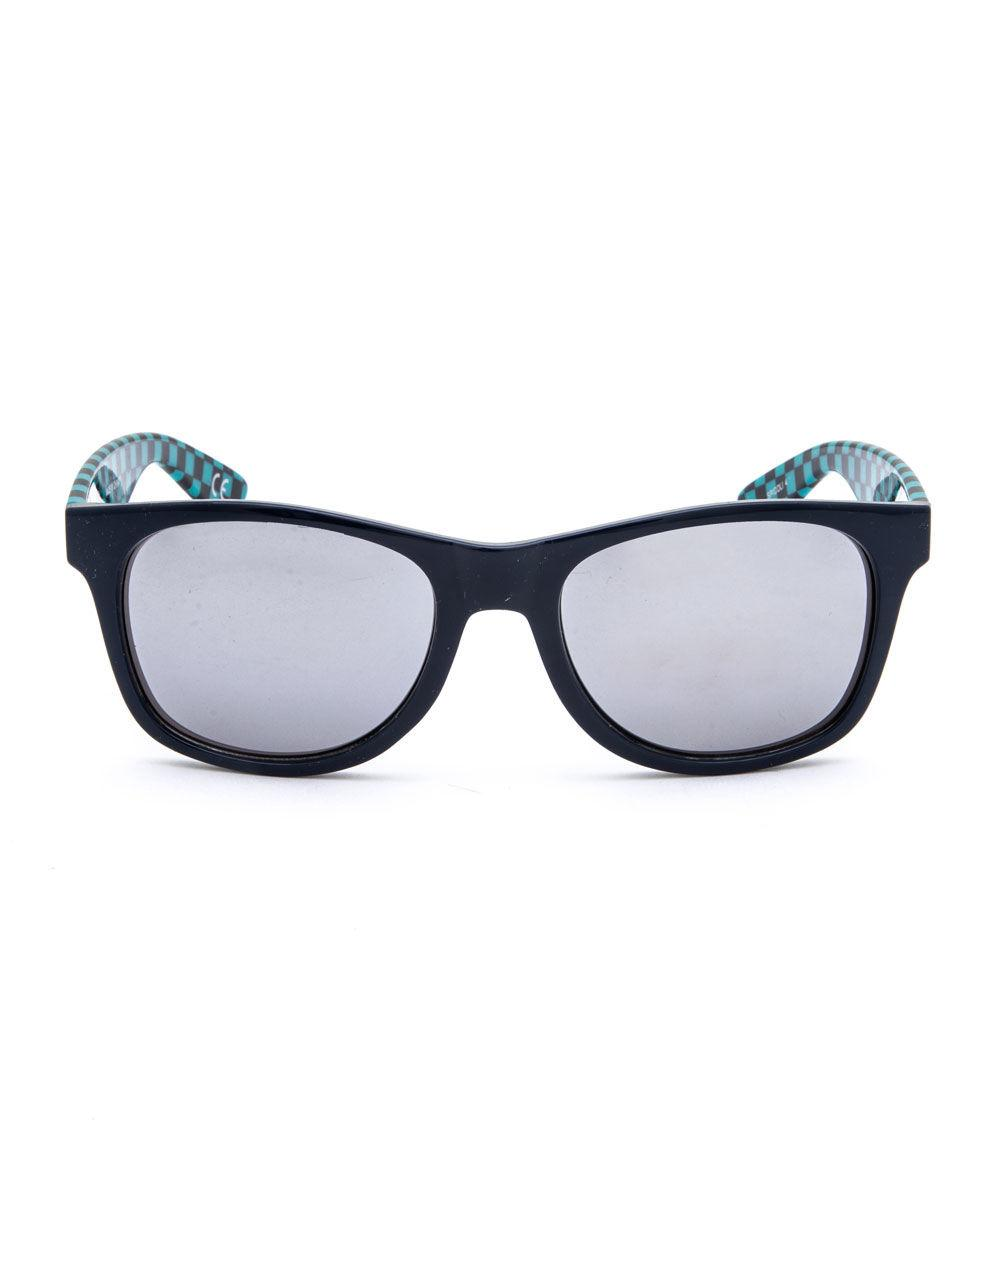 47022c19a04 Lyst - Vans Spicoli Check   Blue Sunglasses in Blue